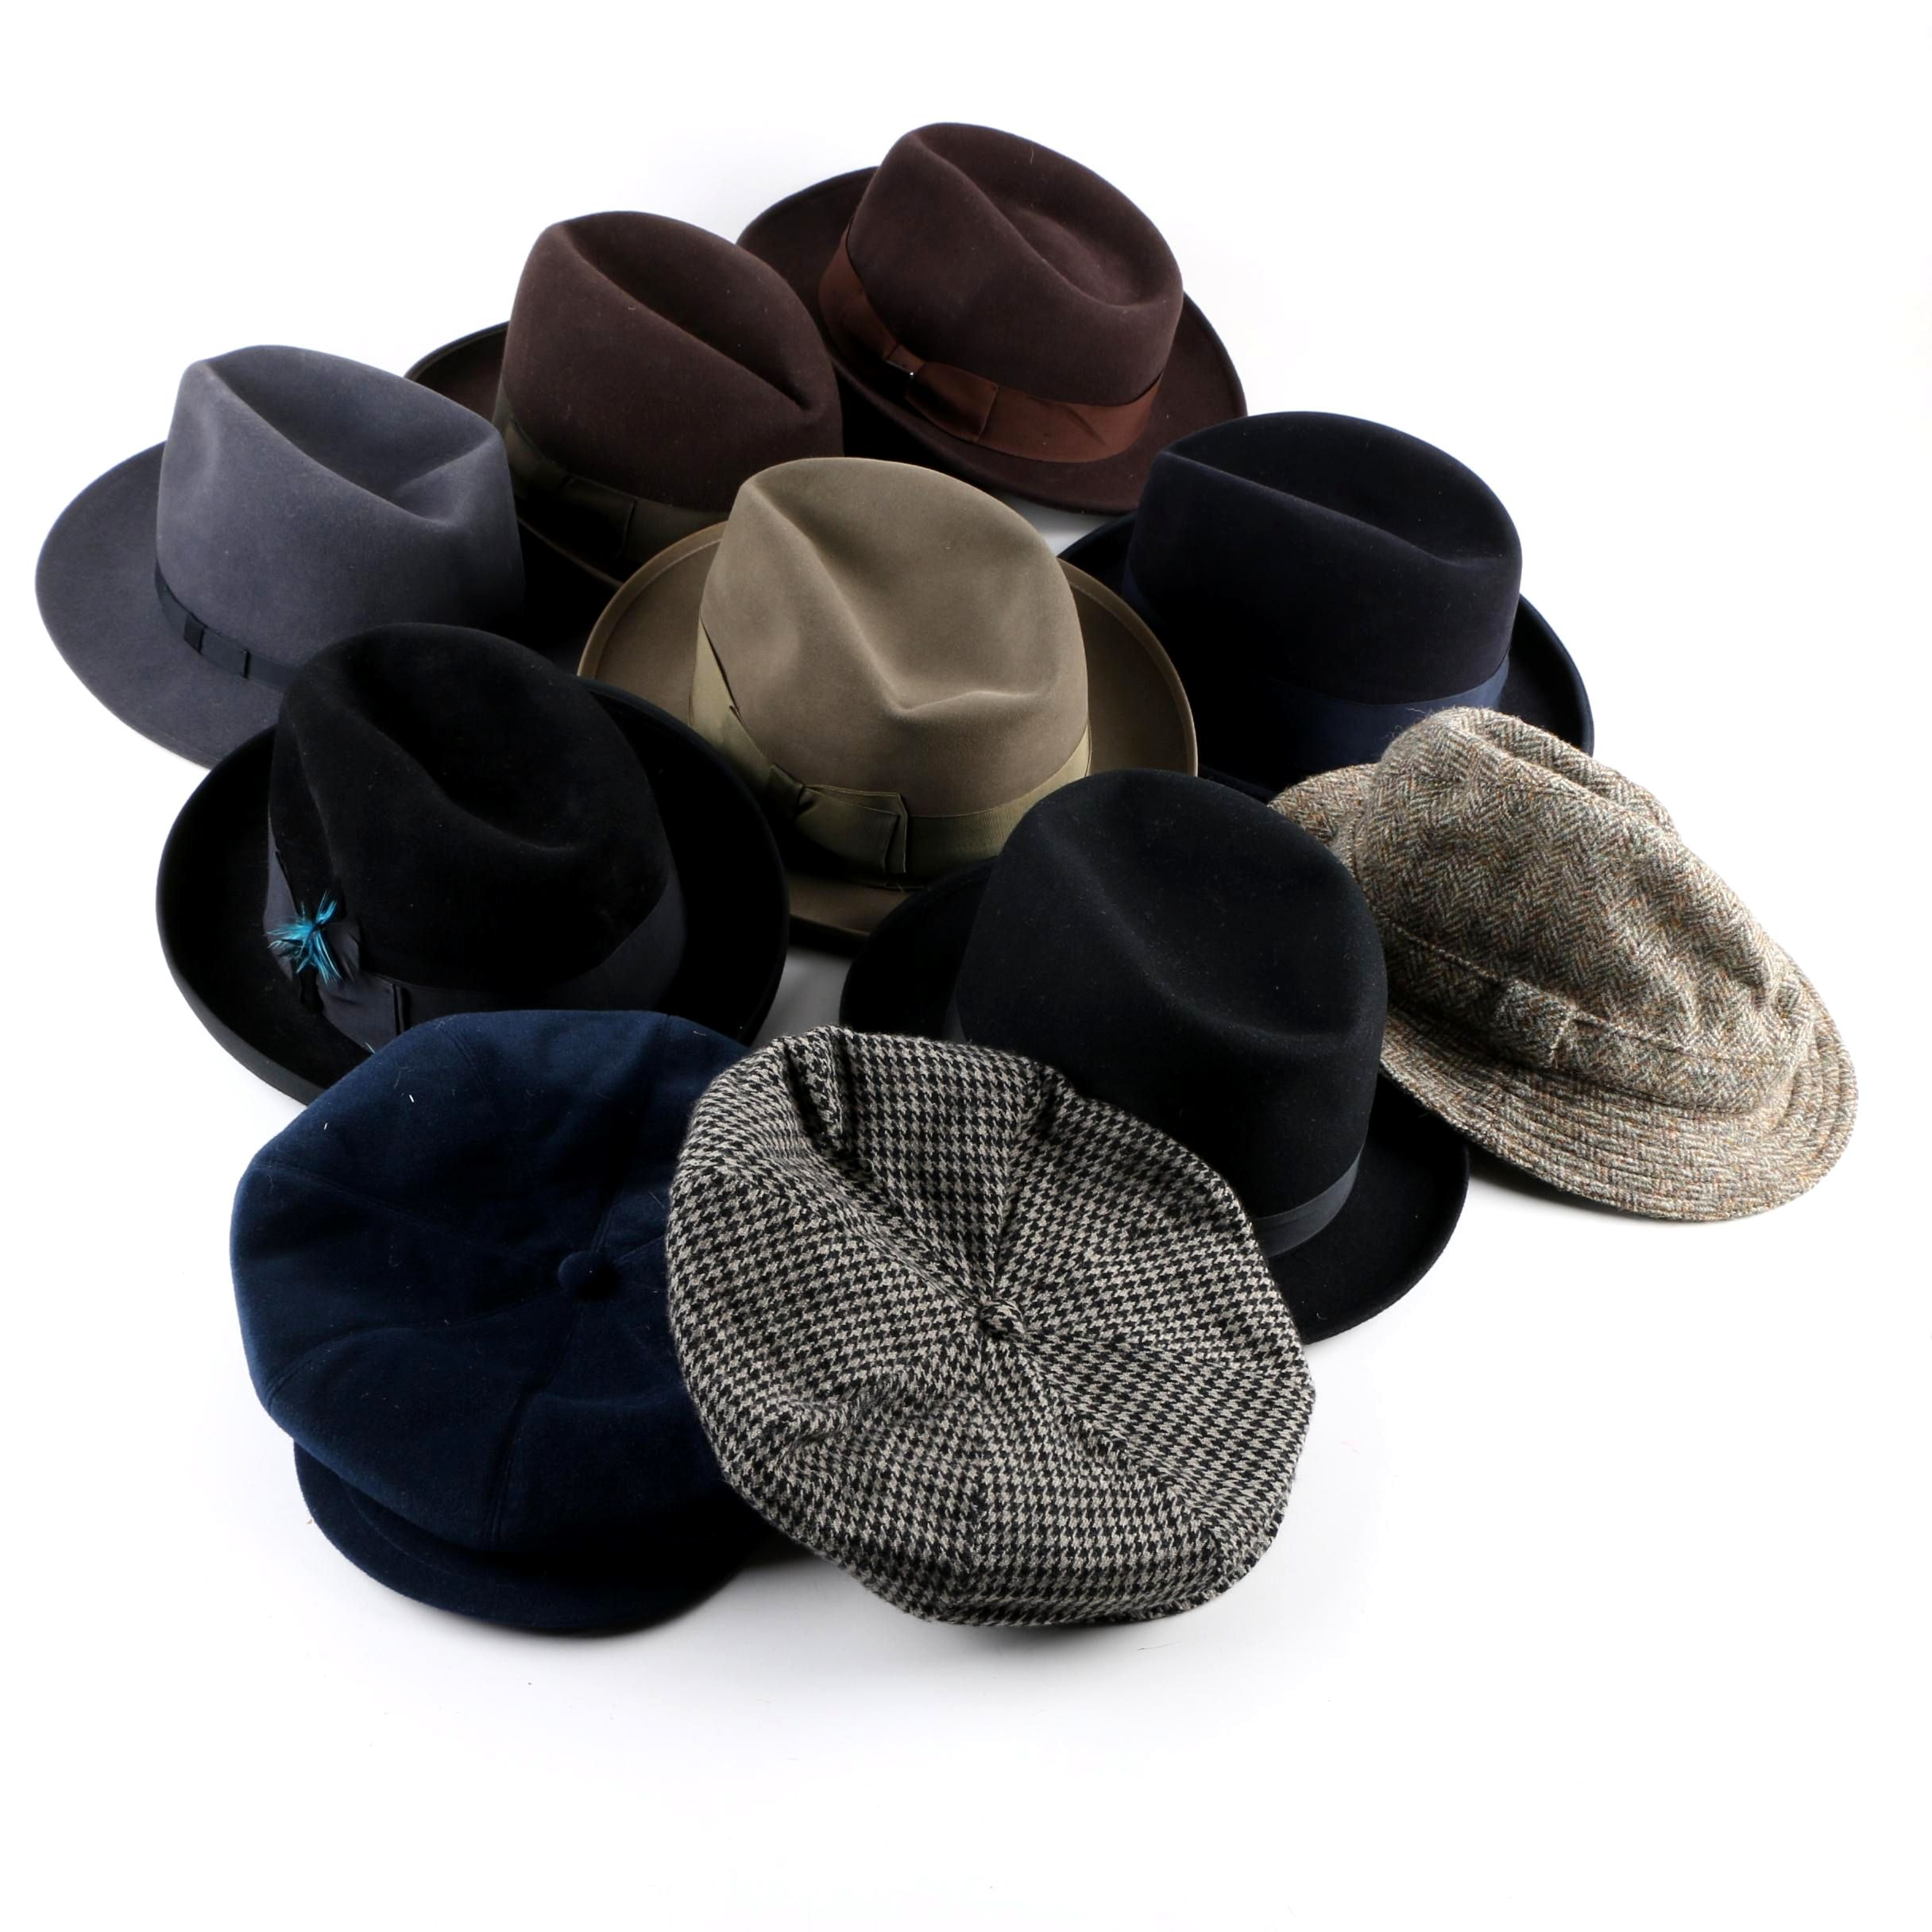 Men's Fedora and Newsboy Hats